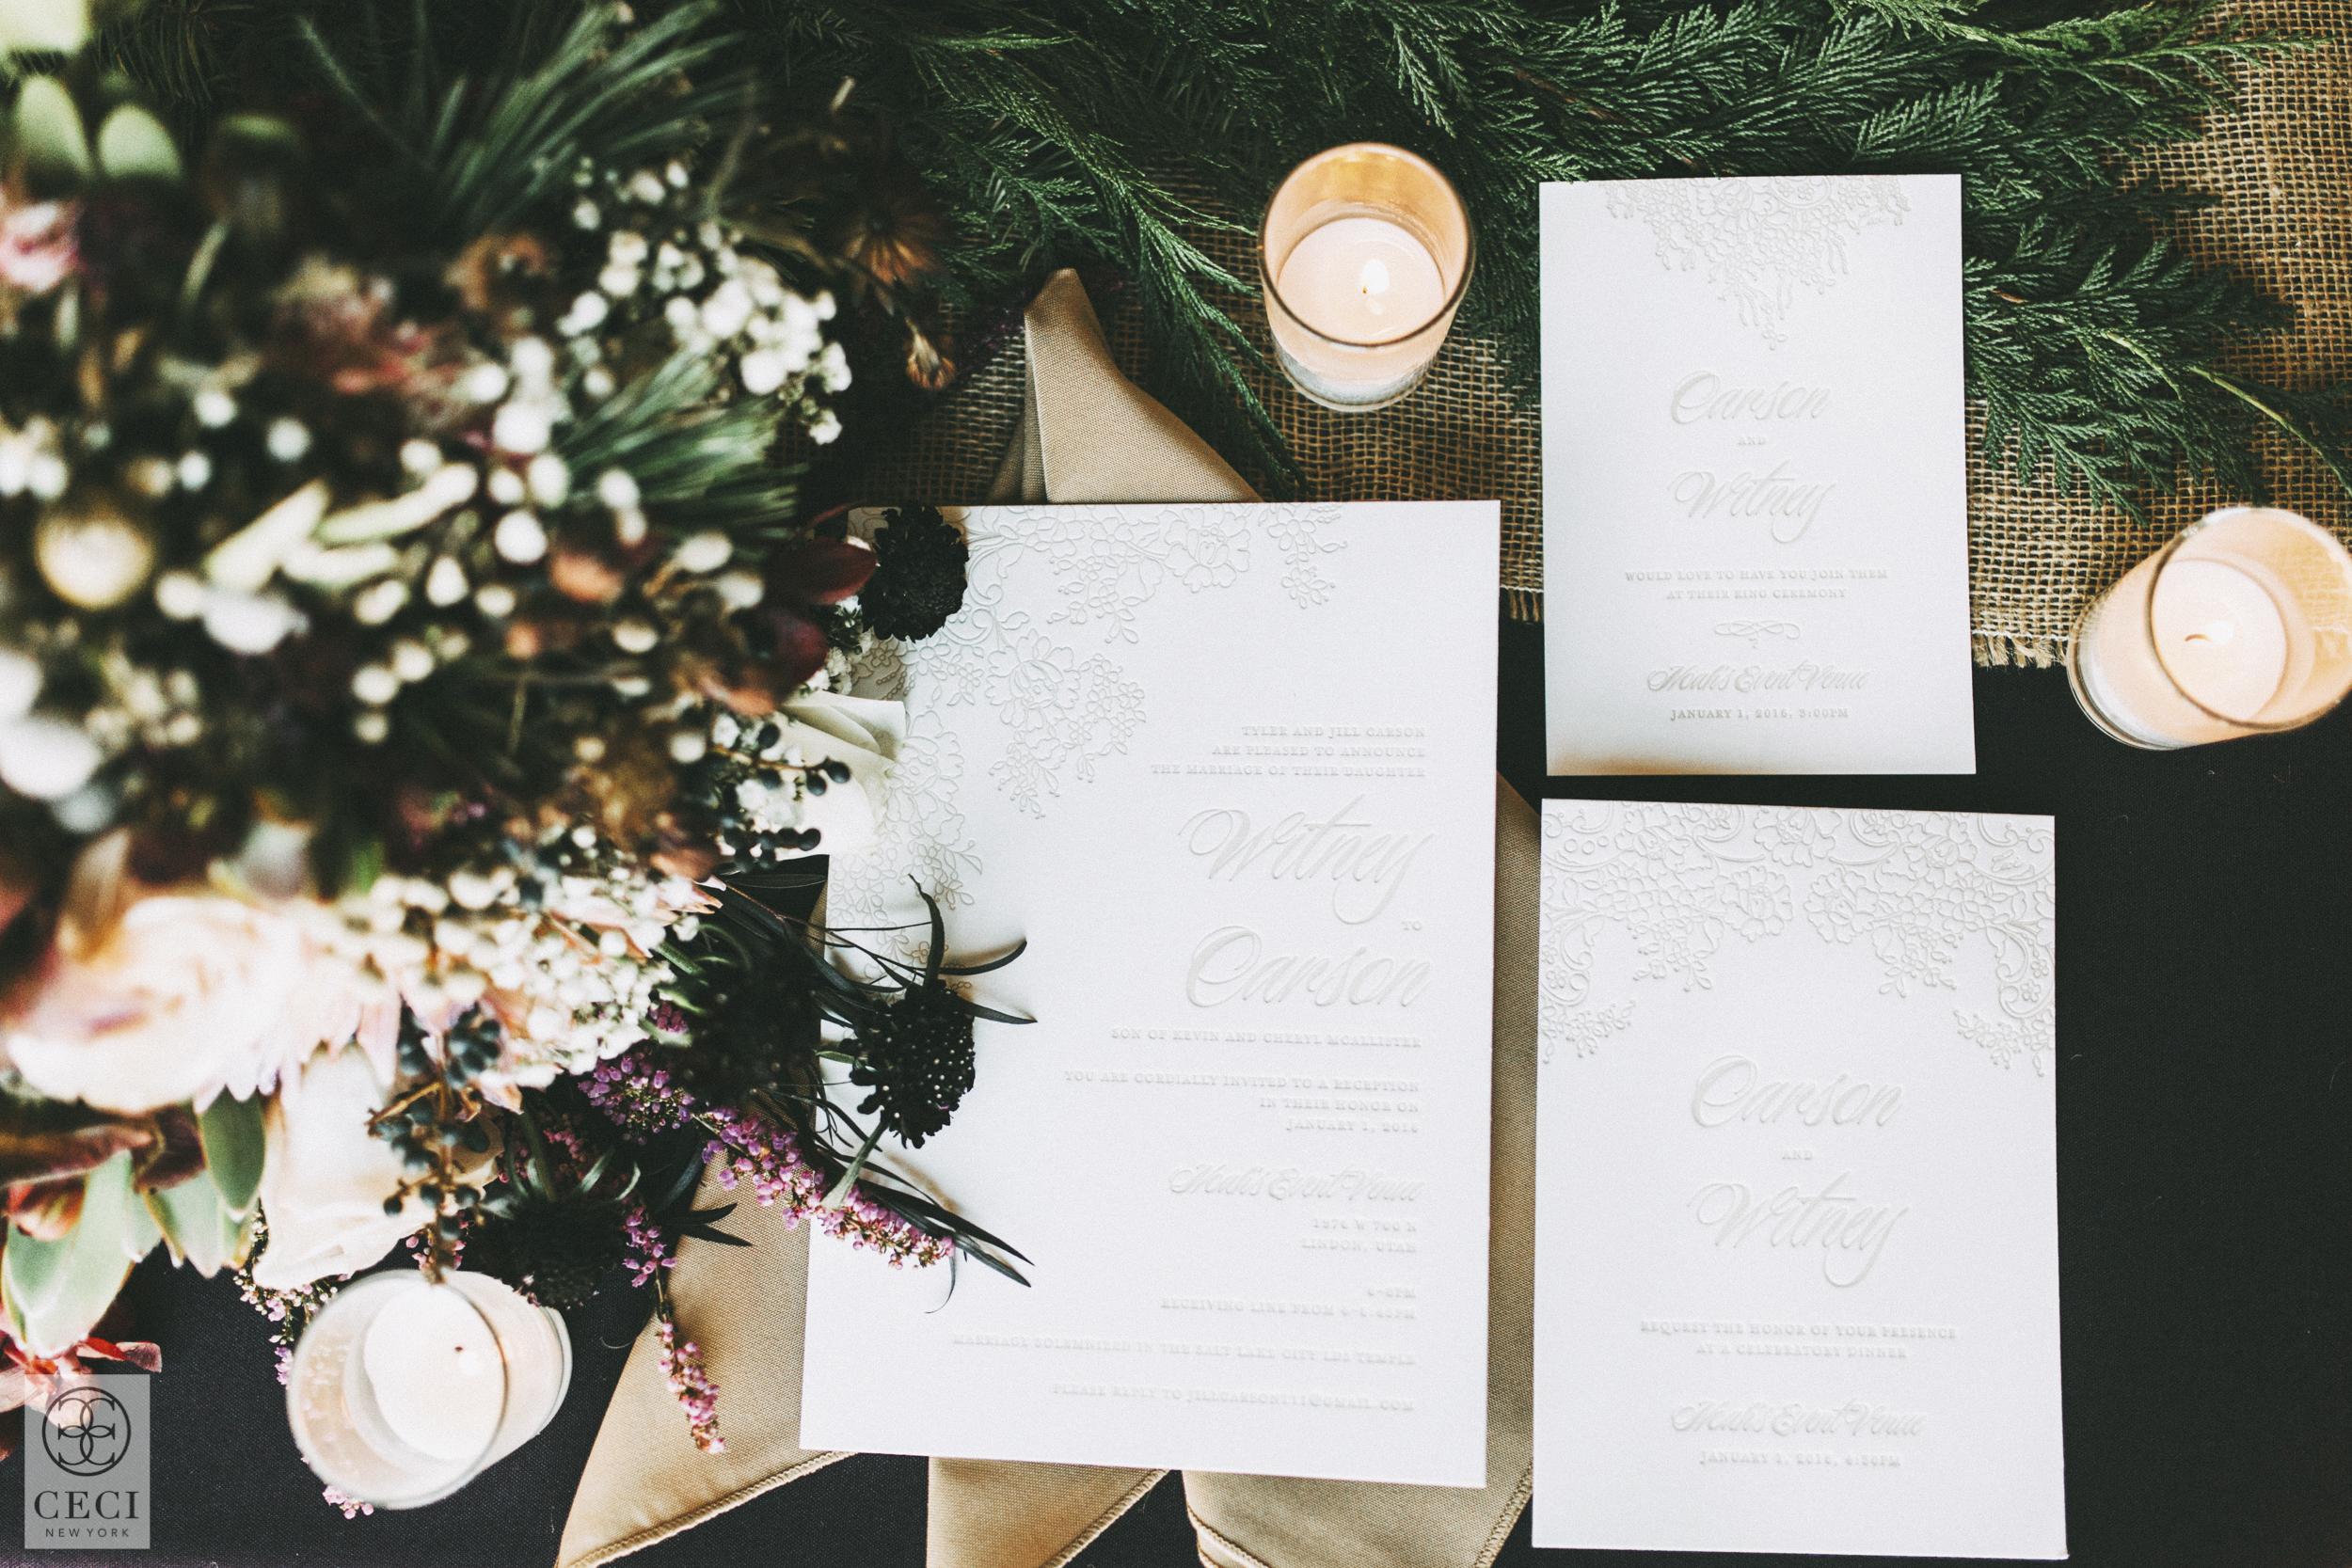 ceci_new_york_wedding_invitation_design_black_red_dramatic_macabre_statement-1.jpg